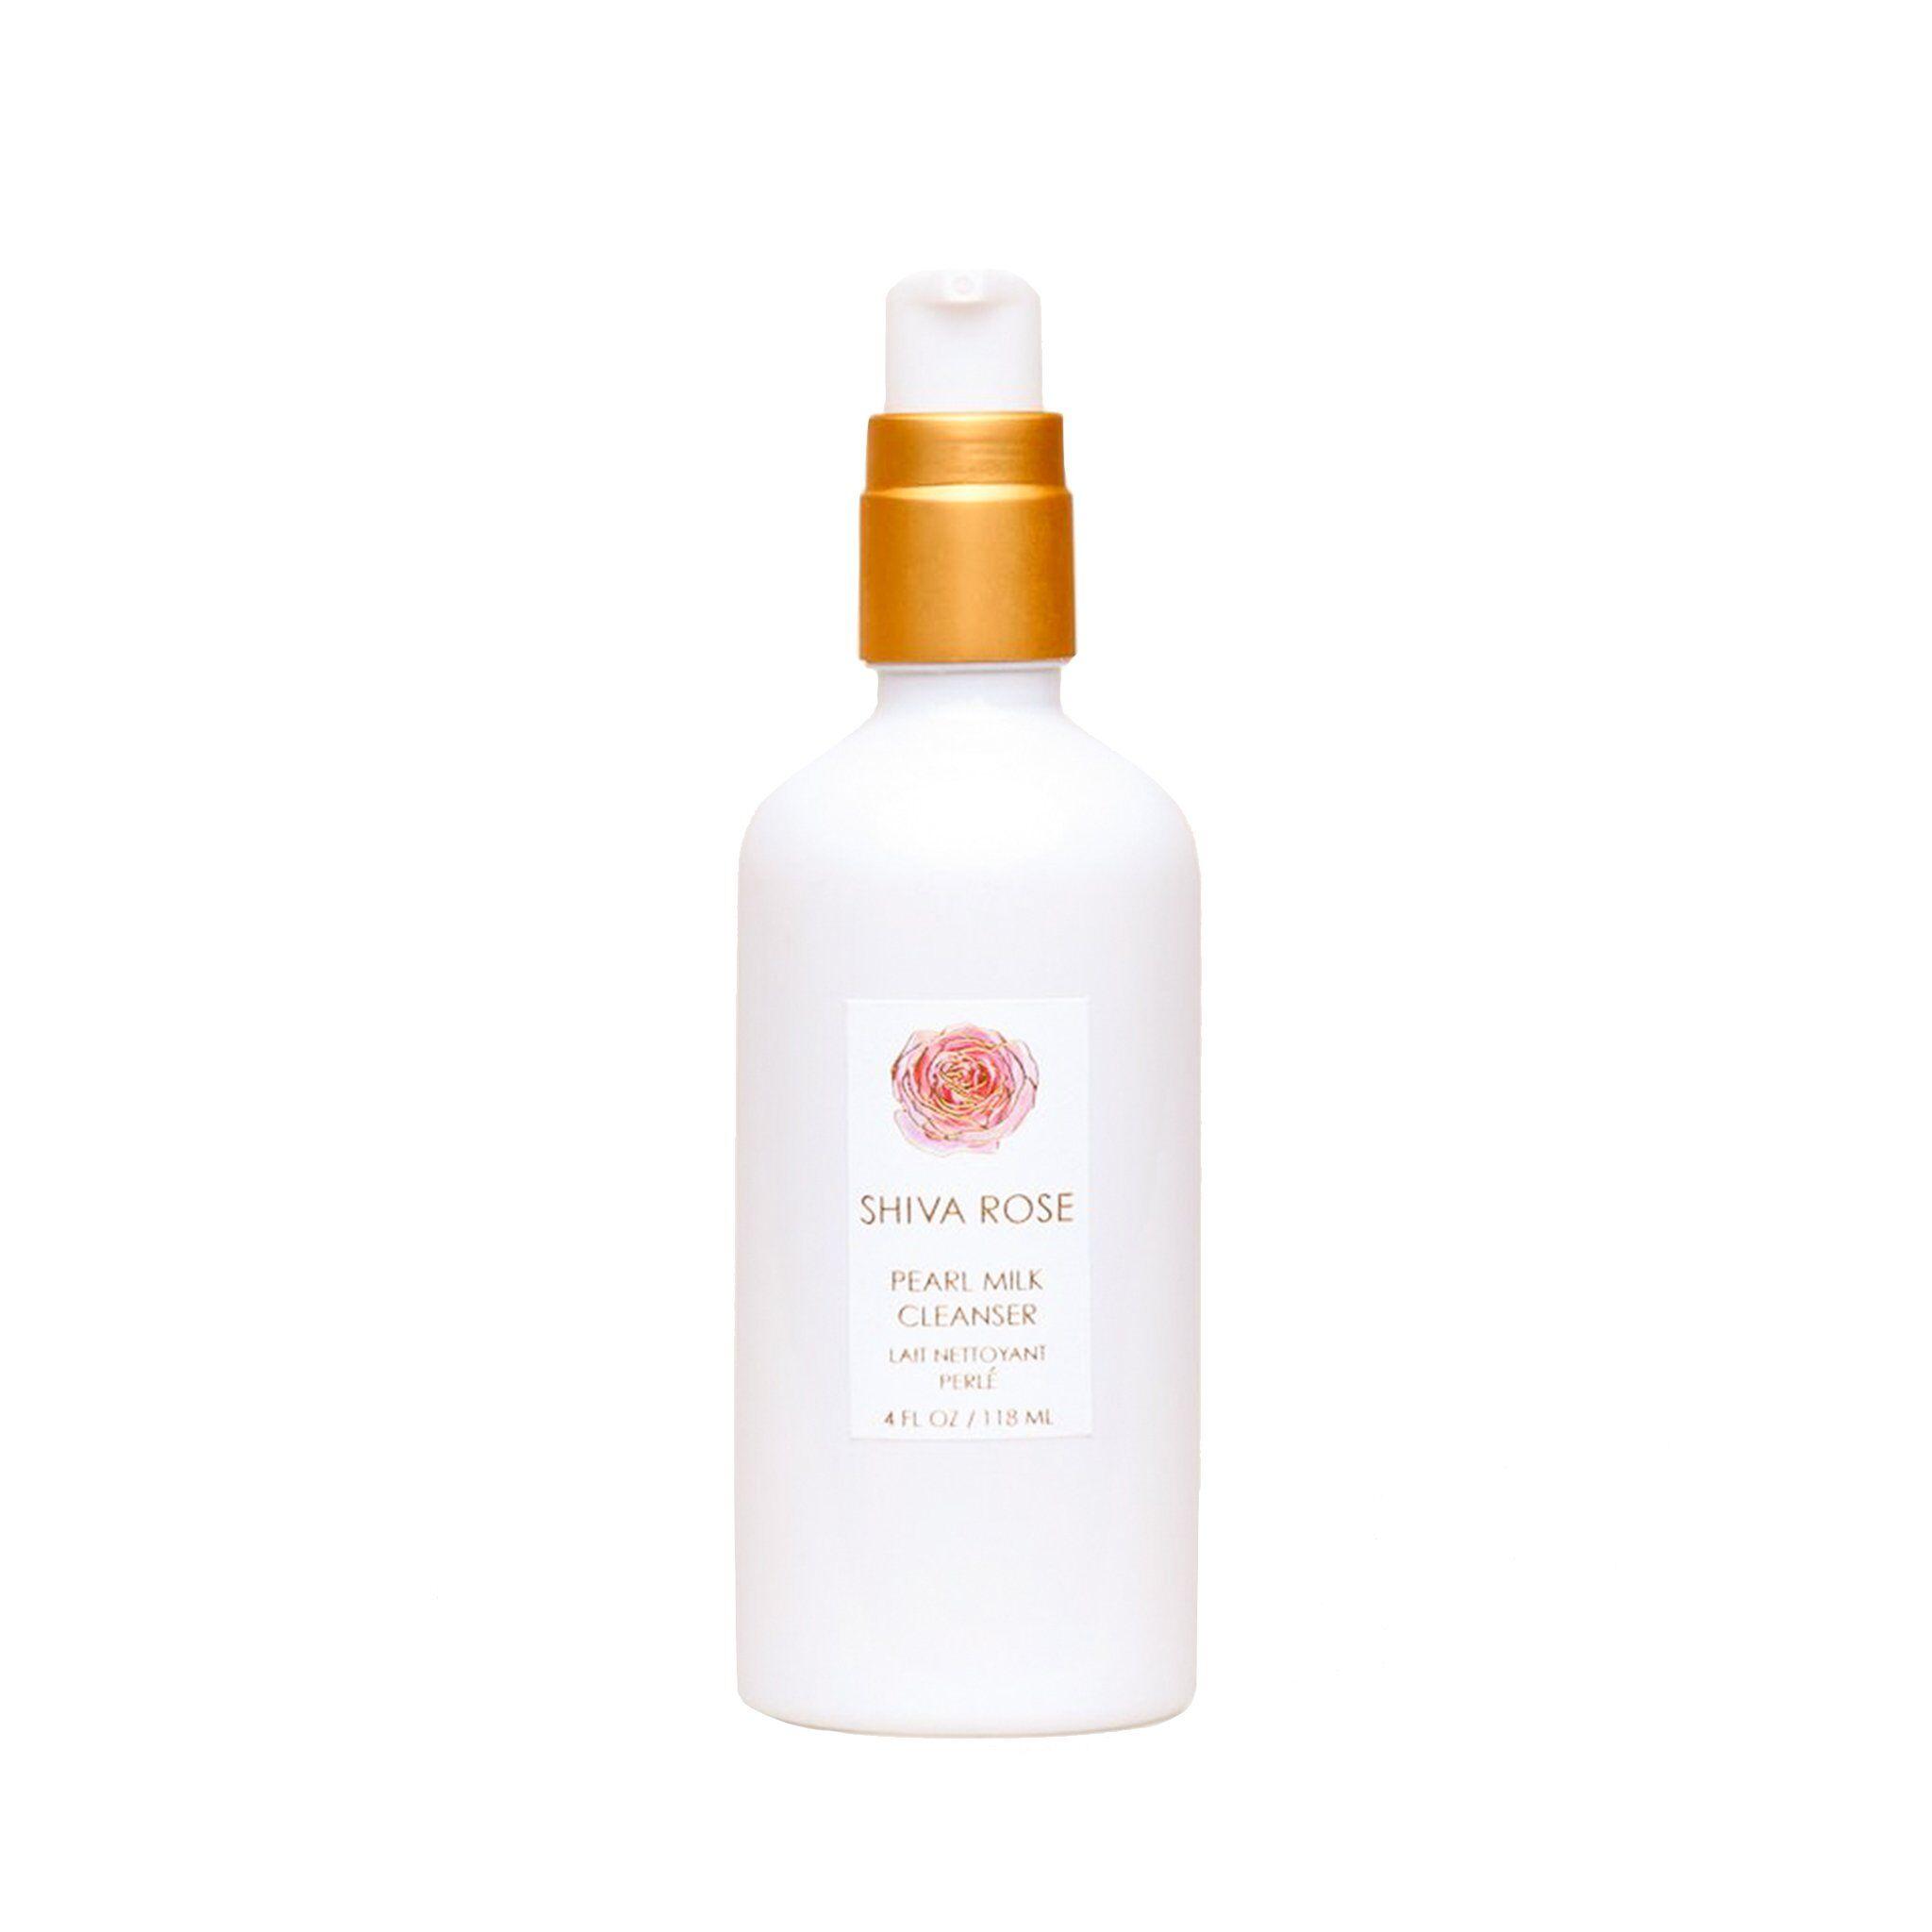 Shiva Rose - Pearl Milk Cleanser by Shiva Rose